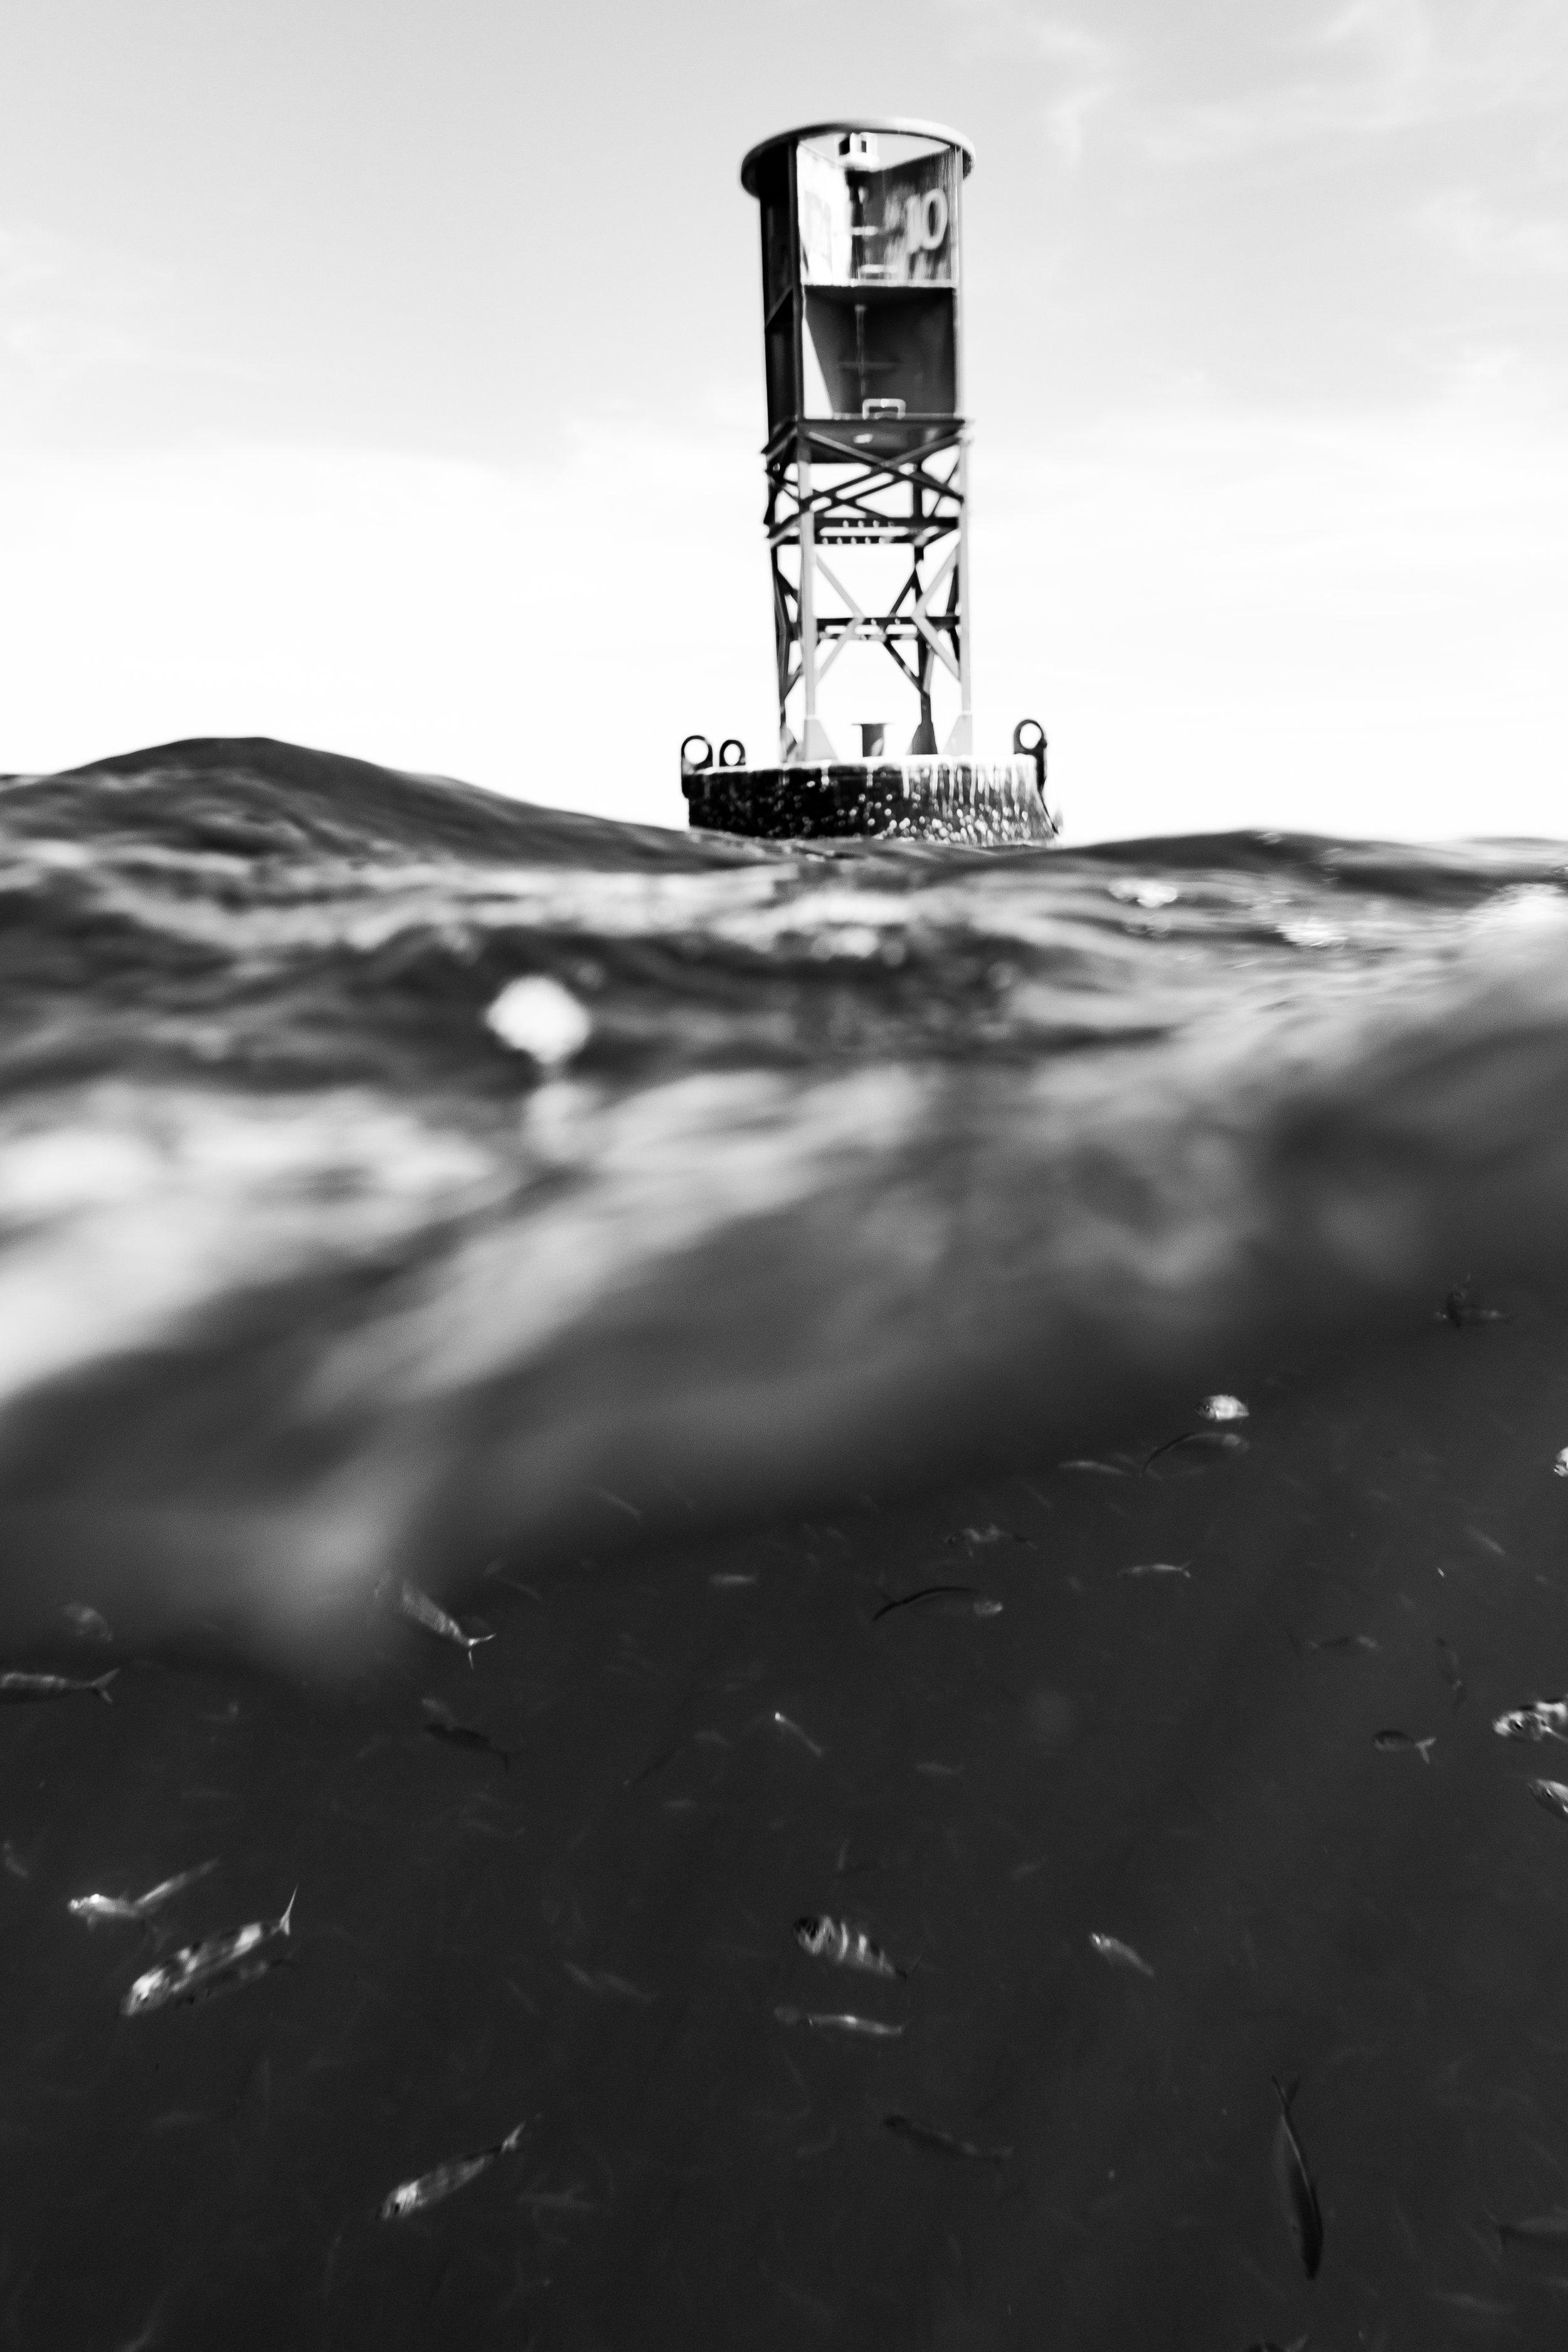 Bethel Buoy of the coast of Ft Pierce, Florida. Photograph by Nathaniel Harrington